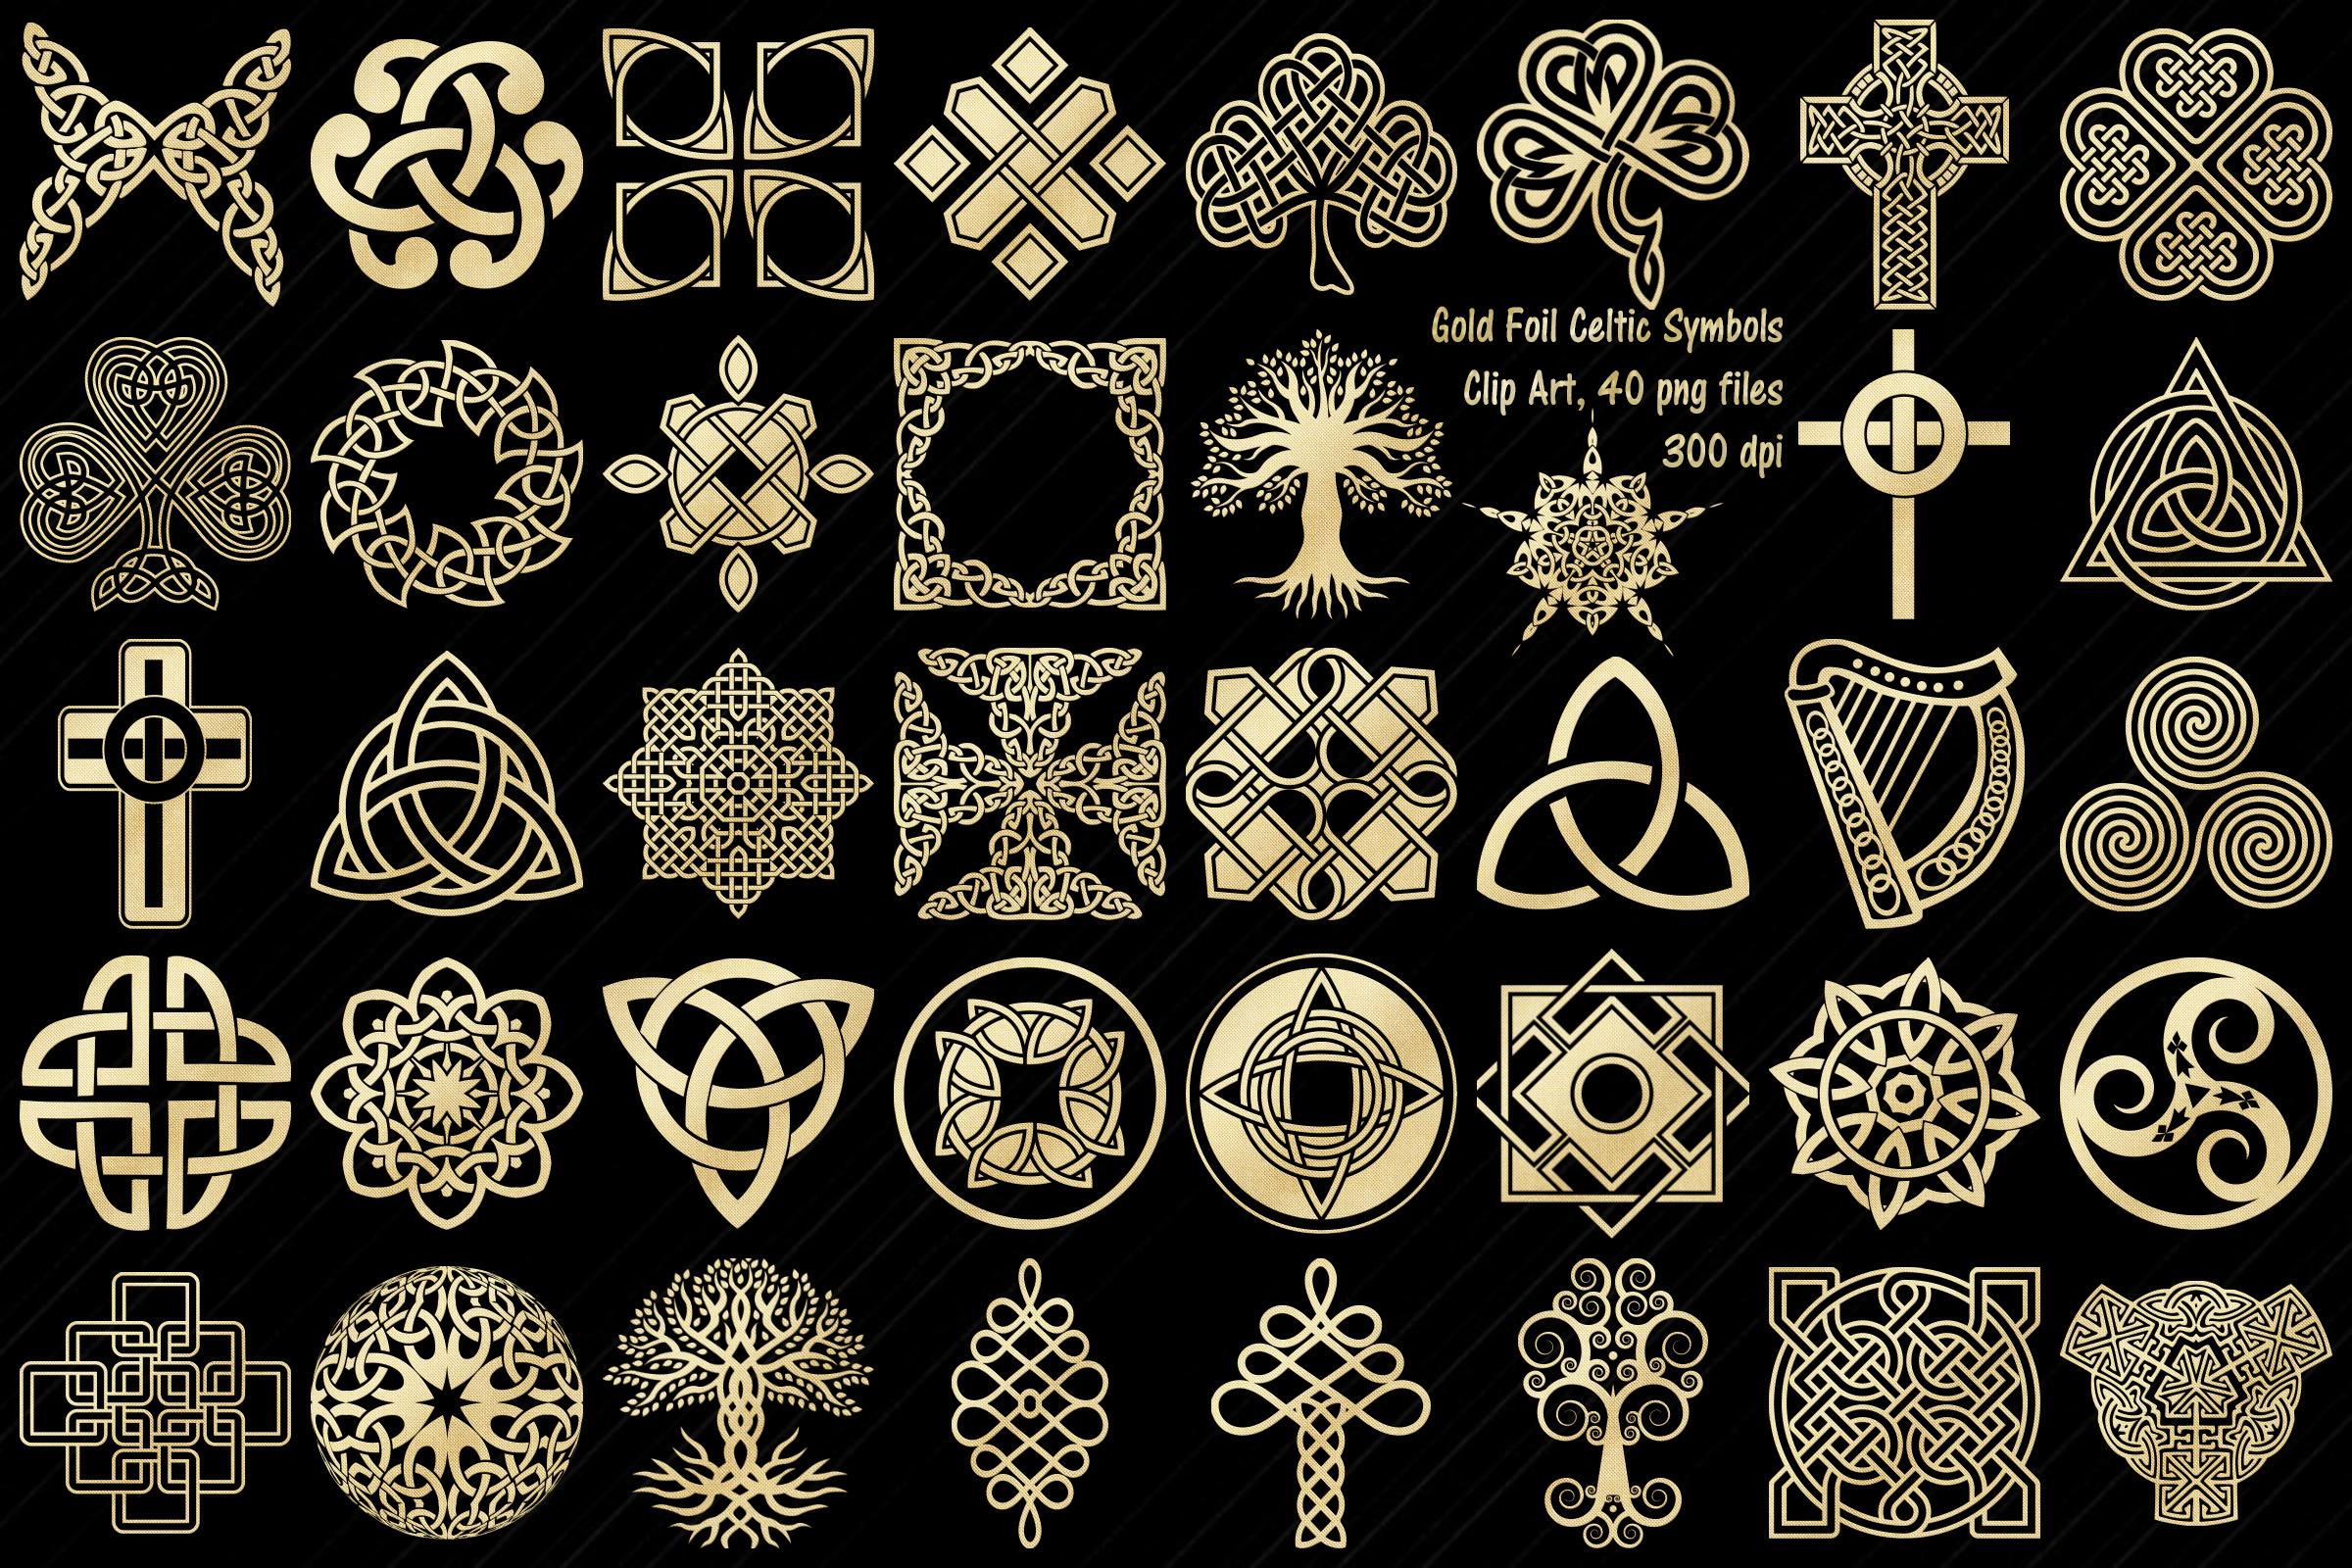 Gold Foil Celtic Symbols, Knots, Crosses Clip Art example image 1